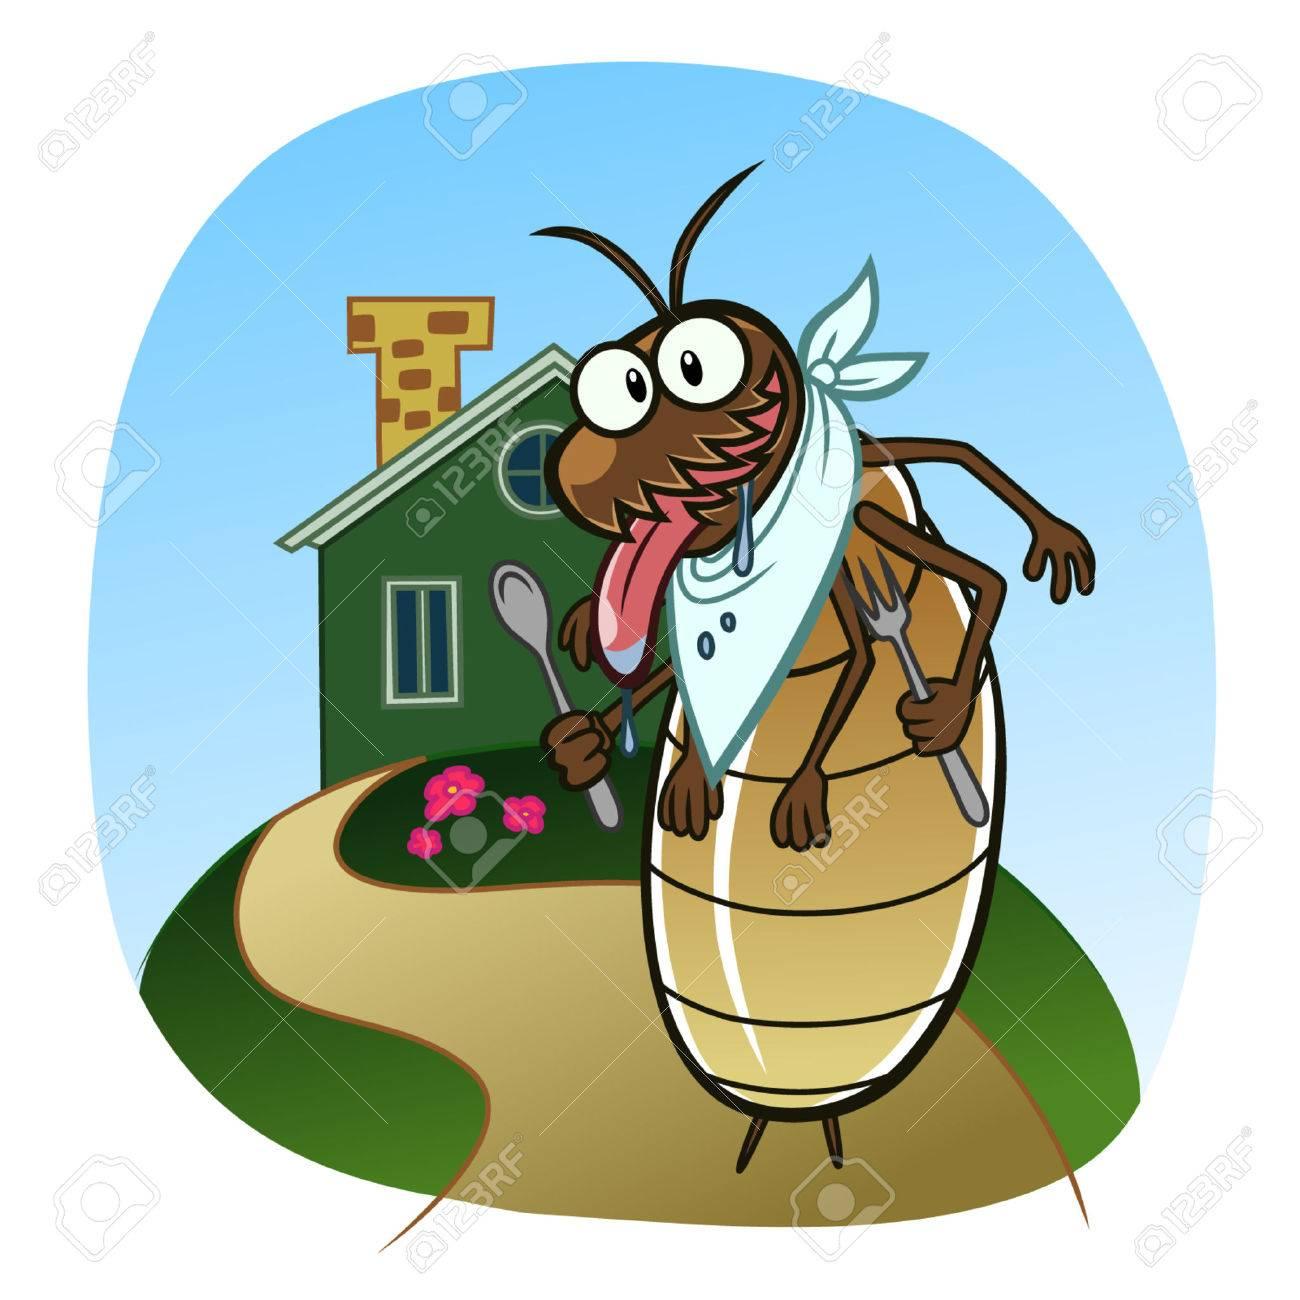 Termite go to house - 39645761